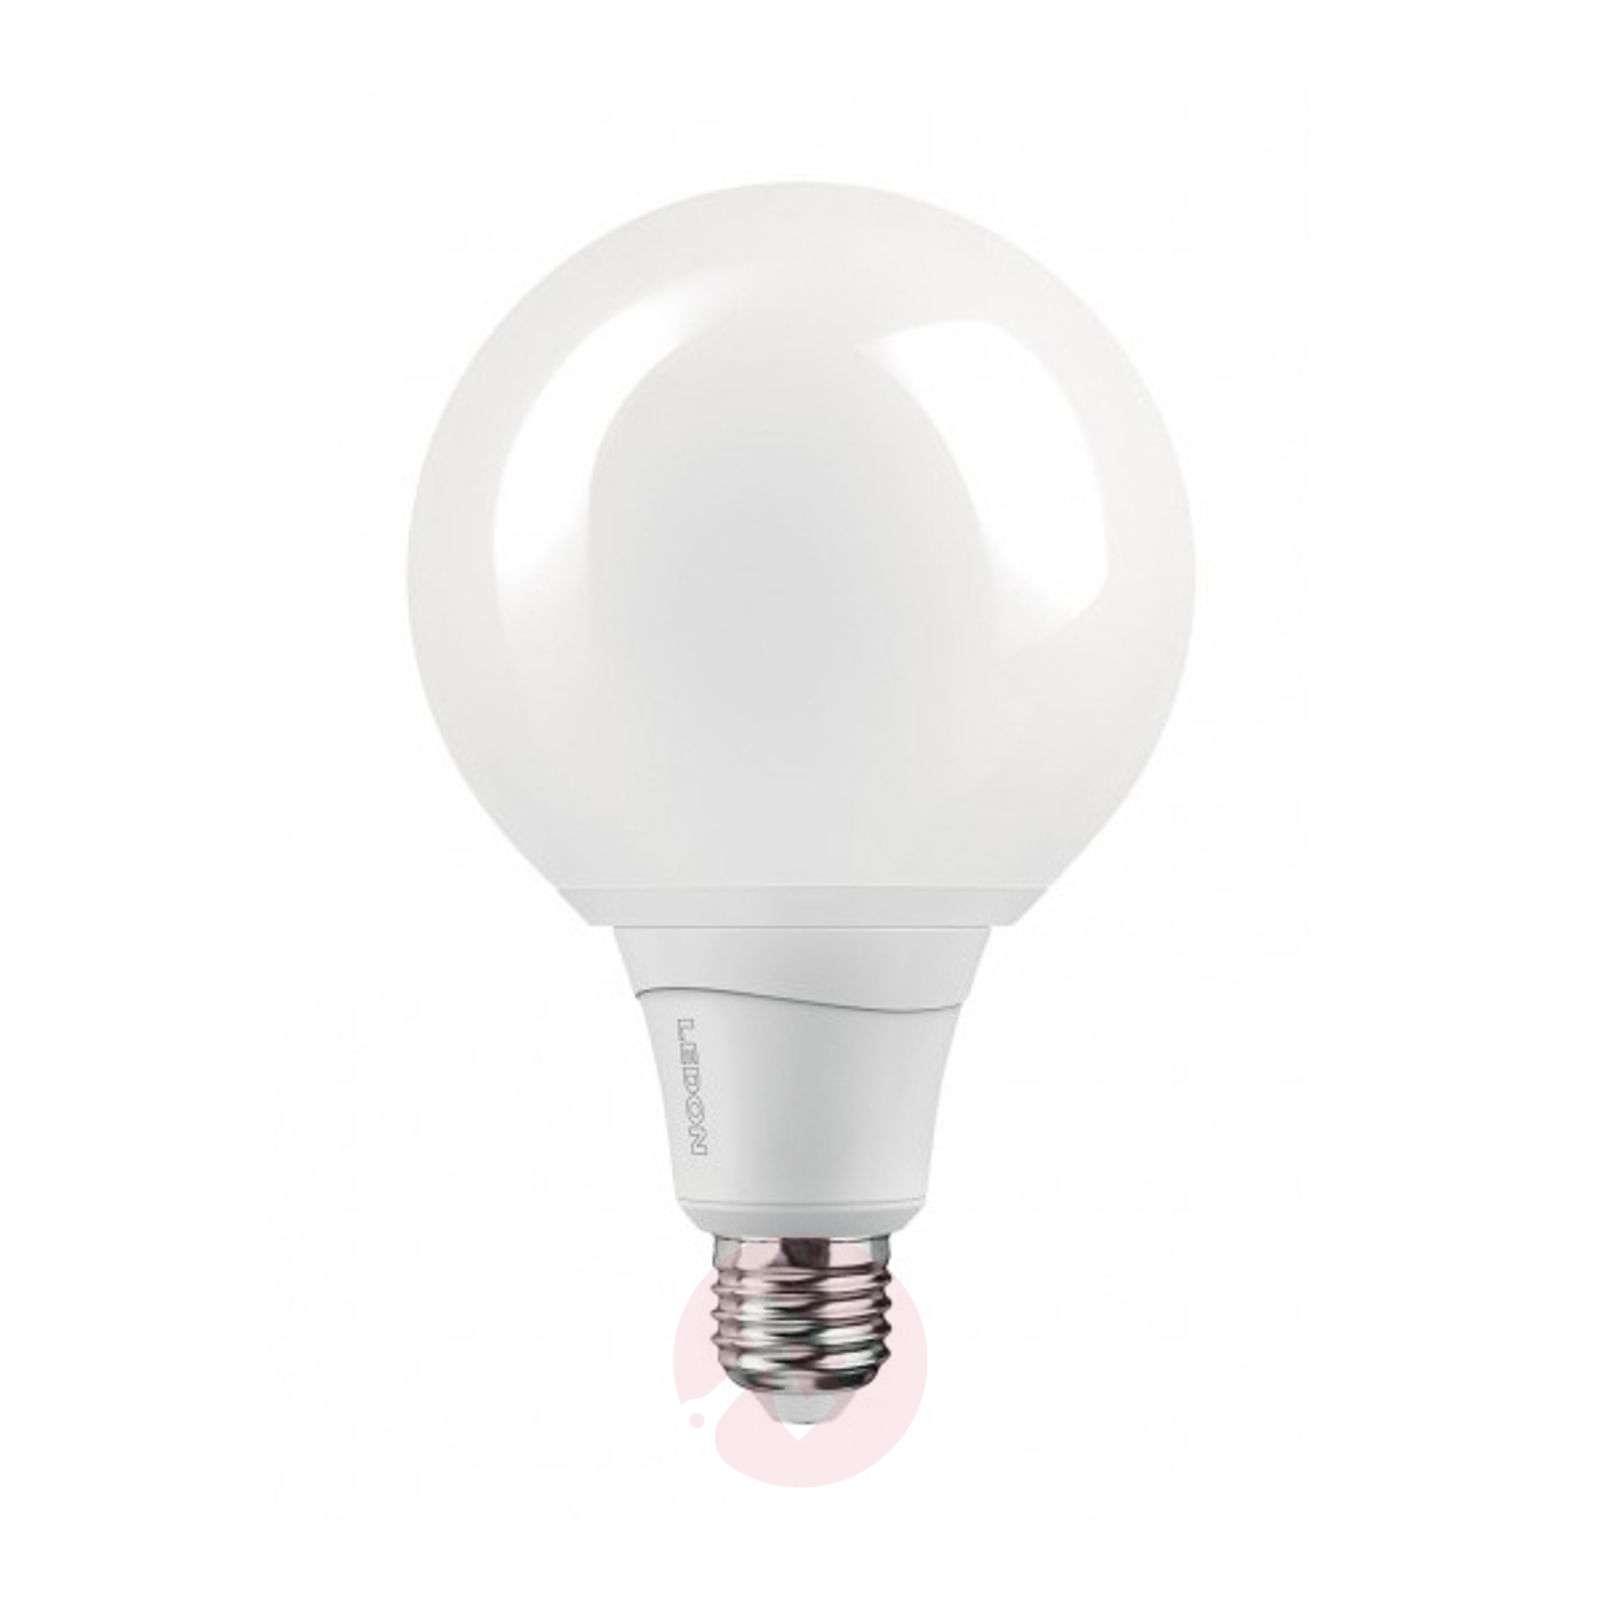 E27 10W 827/840 LED-hehkulamppu G120 color work-6037120-01